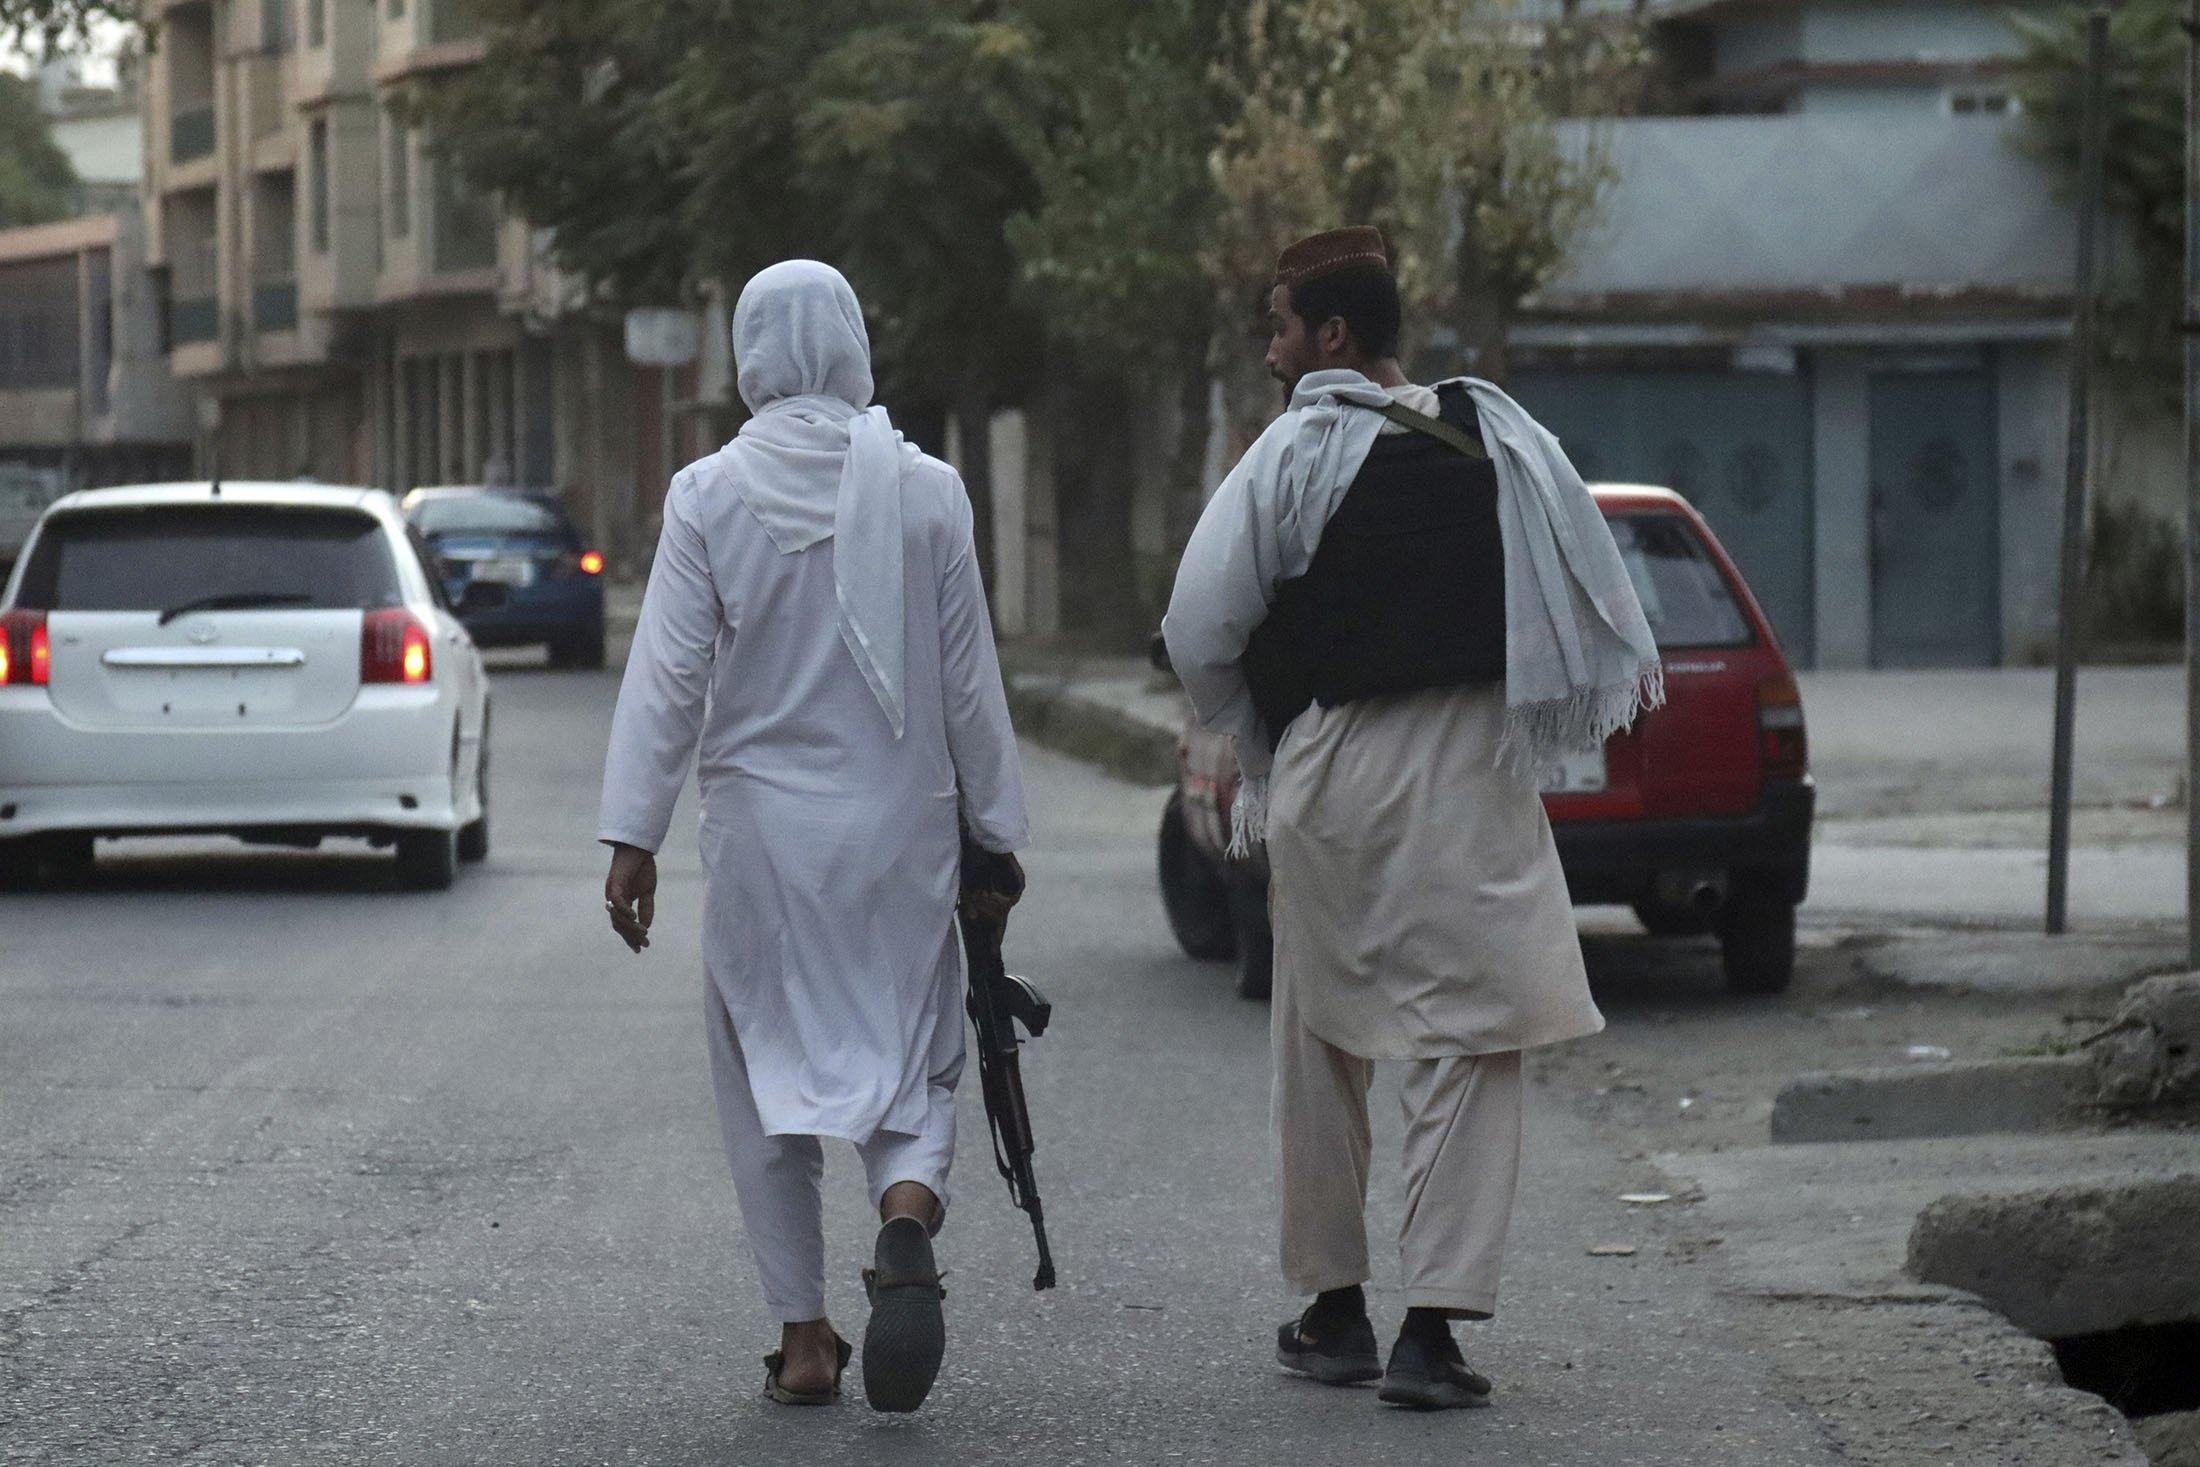 Taliban fighters patrol in Kabul, Afghanistan, Aug. 28, 2021. (AP Photo)